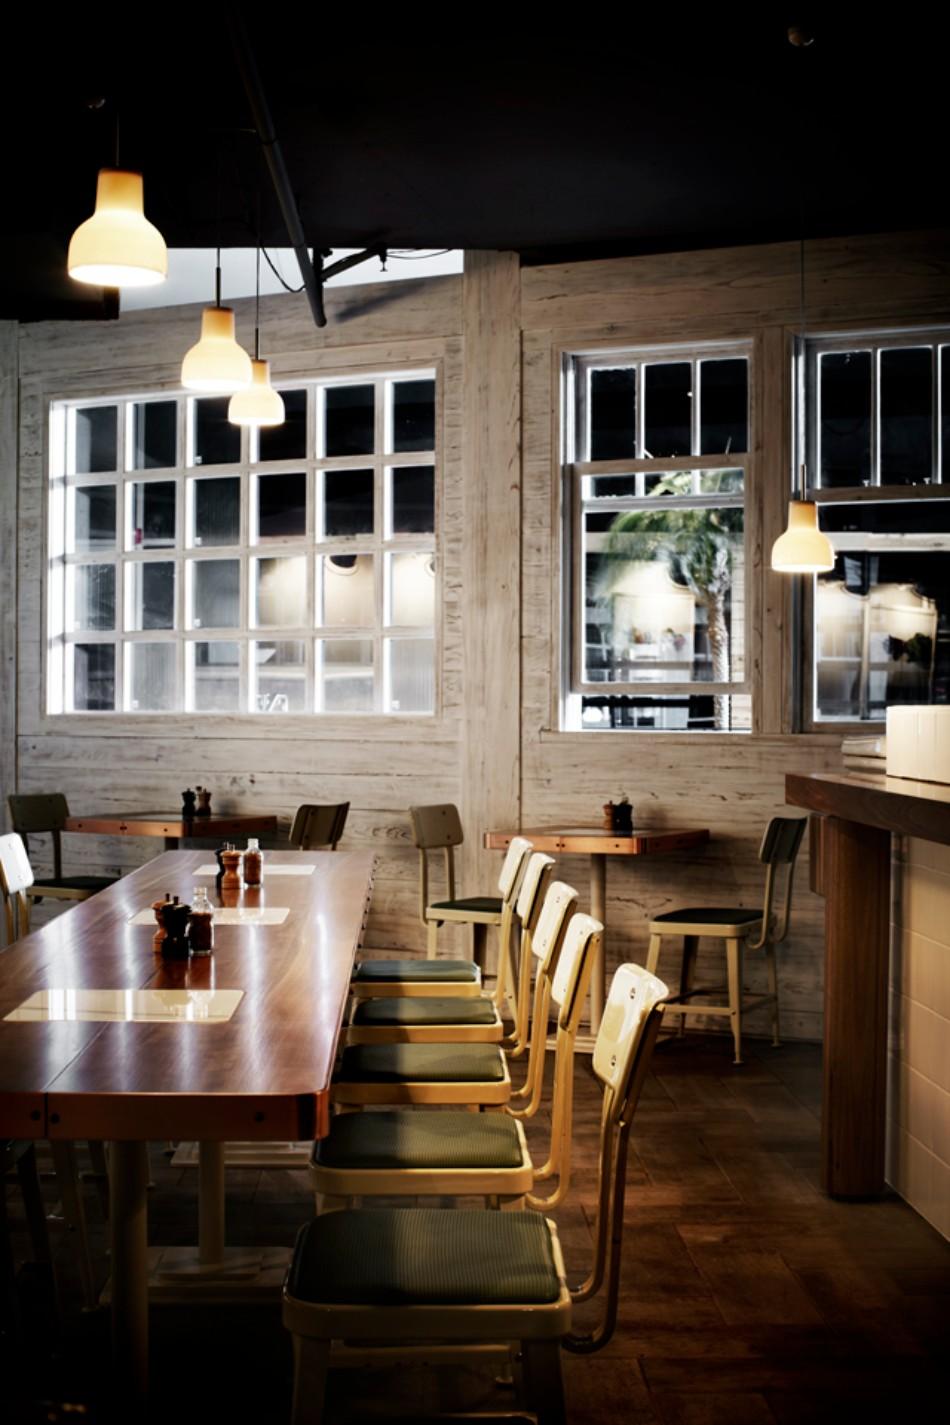 Restaurants We Love Cozy Dining Area Designed by Hassell Studio | www.bocadolobo.com #interiordesign #restaurants #roomdesign #diningroom #thediningroom #hassell #topinteriordesigners #famousinteriordesigners #interiordesigners #moderndiningtables #moderndiningchairs #diningchairs @moderndiningtables